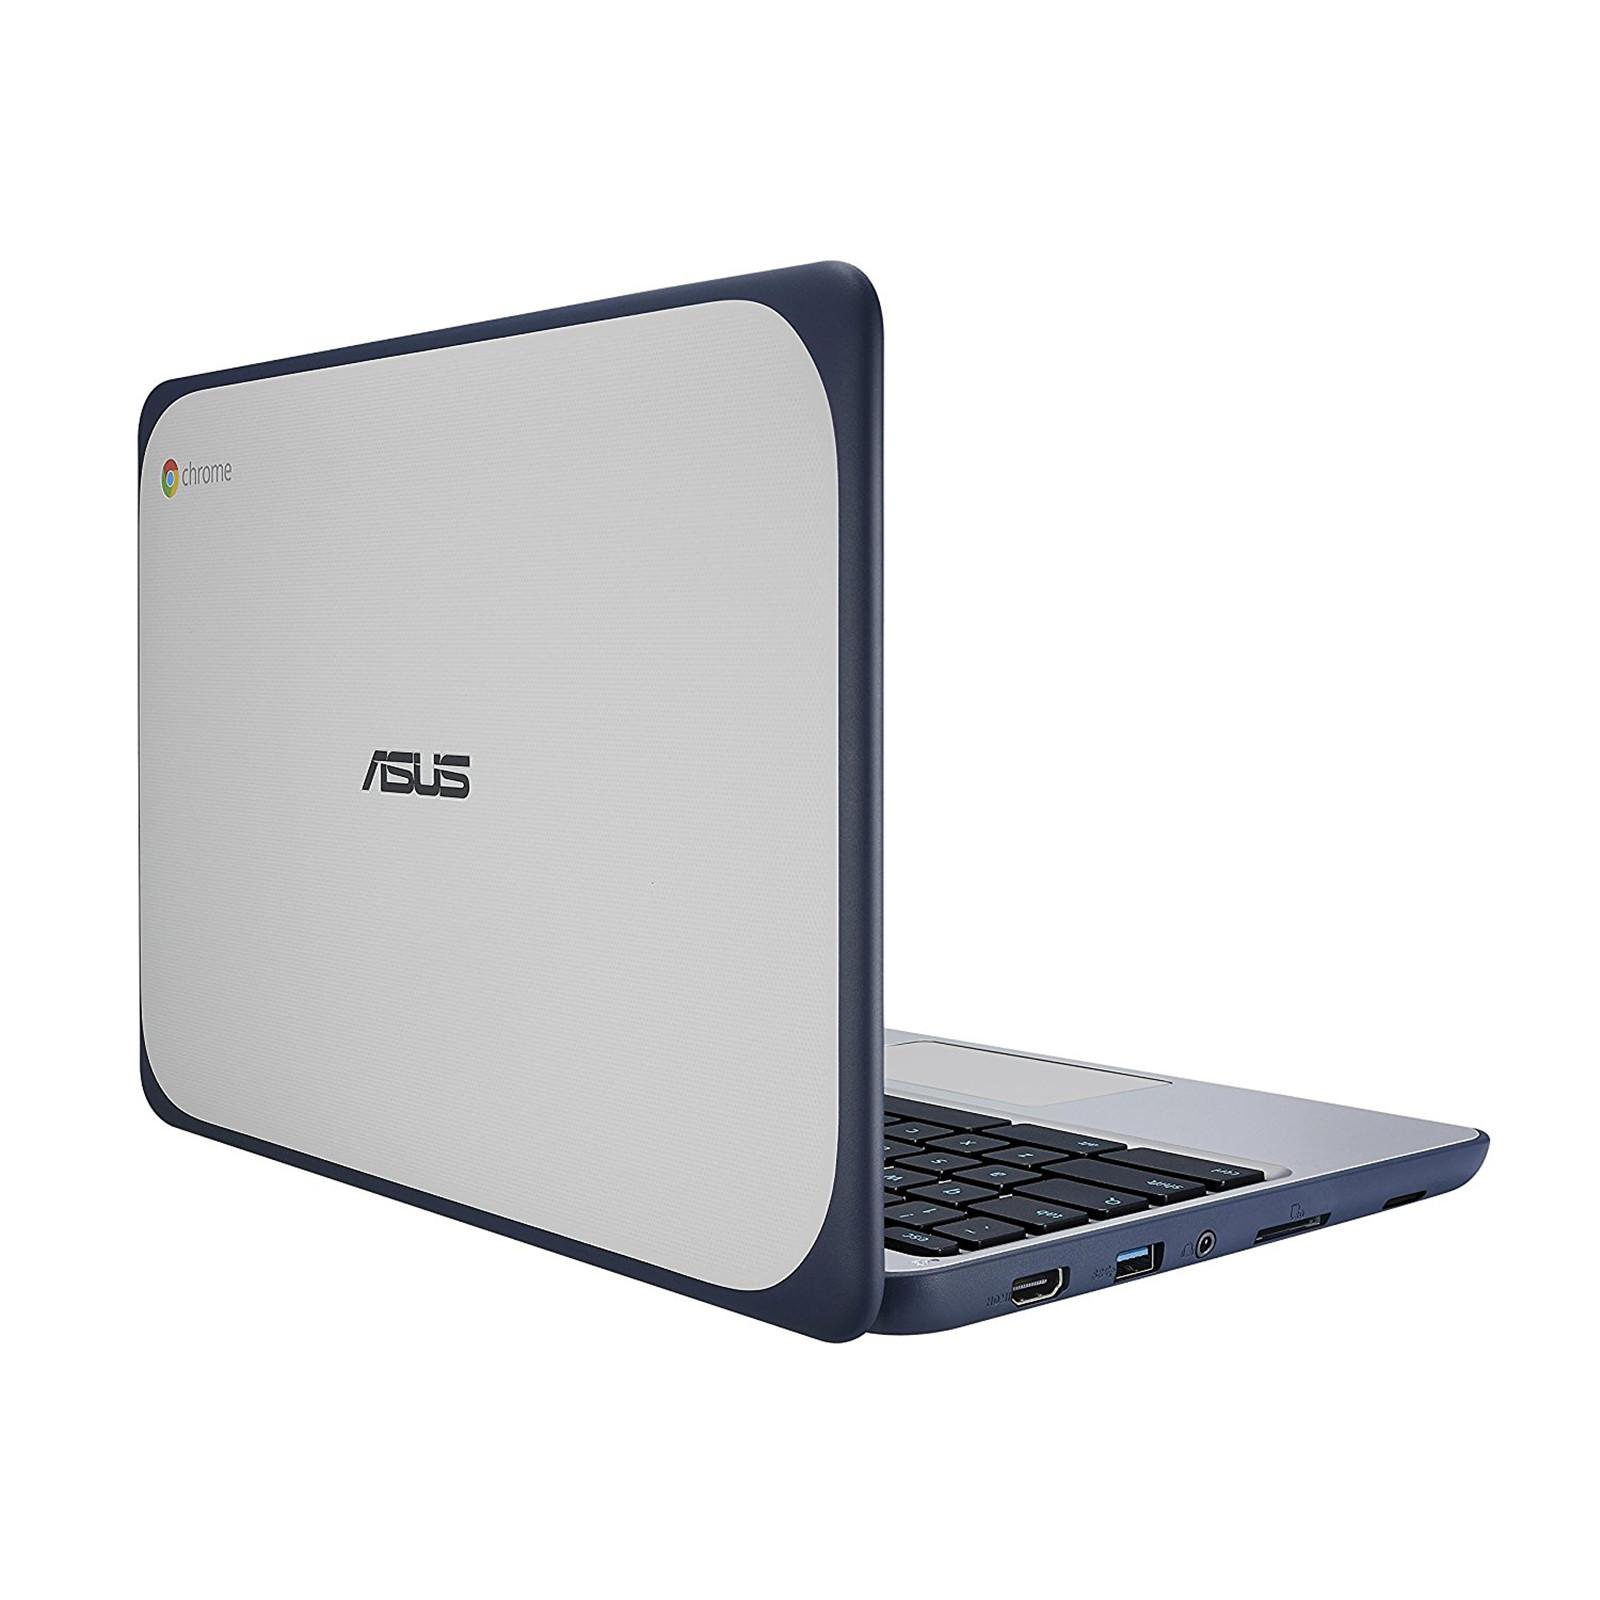 Buy the ASUS C202SA-GJ0065 Rugged Education Chromebook 11 6